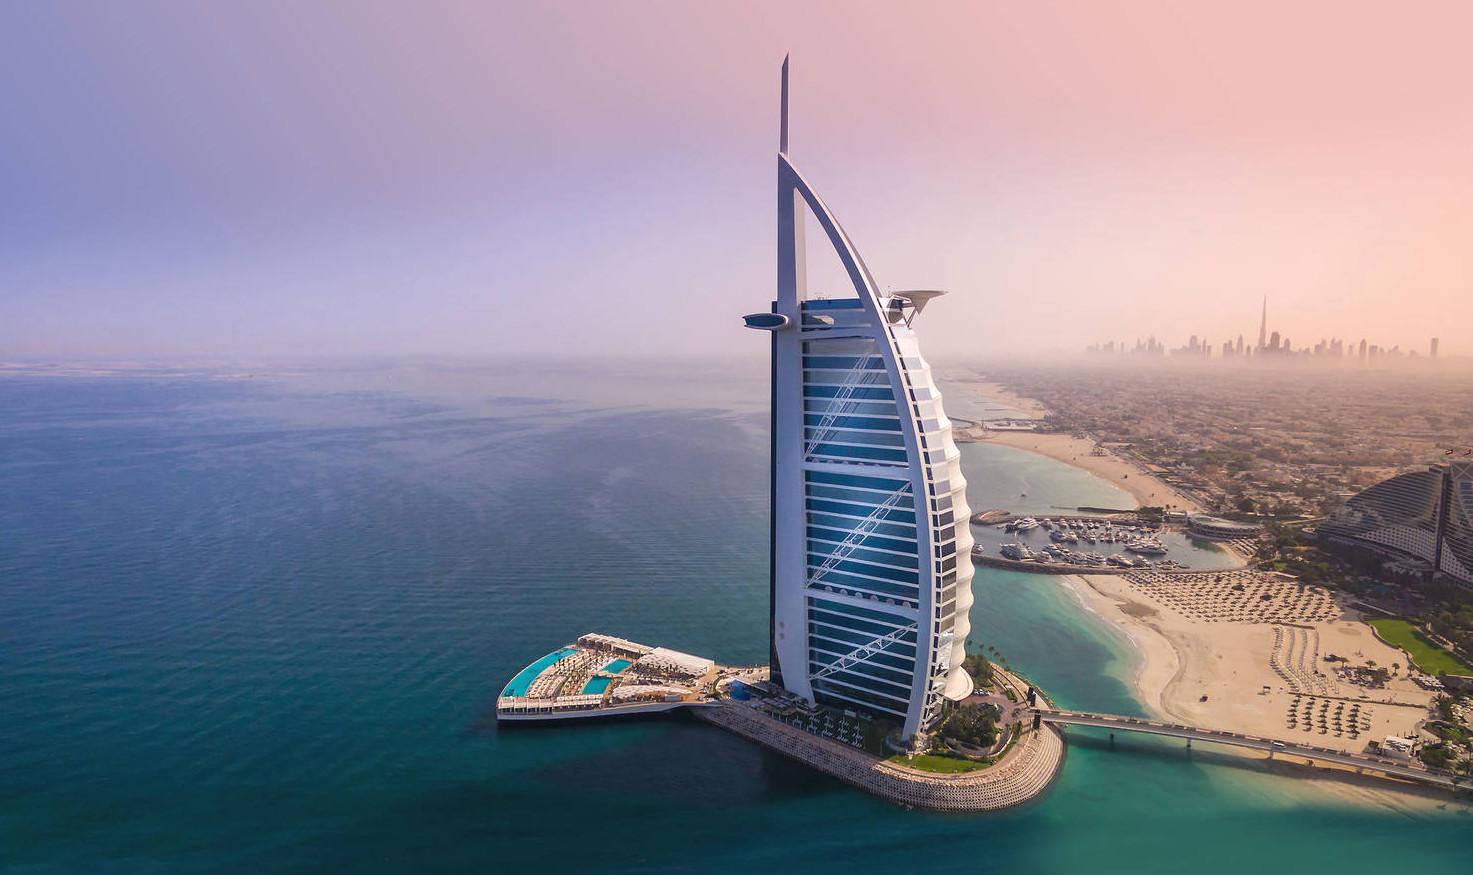 Dubai's lavish Burj Al Arab Hotel